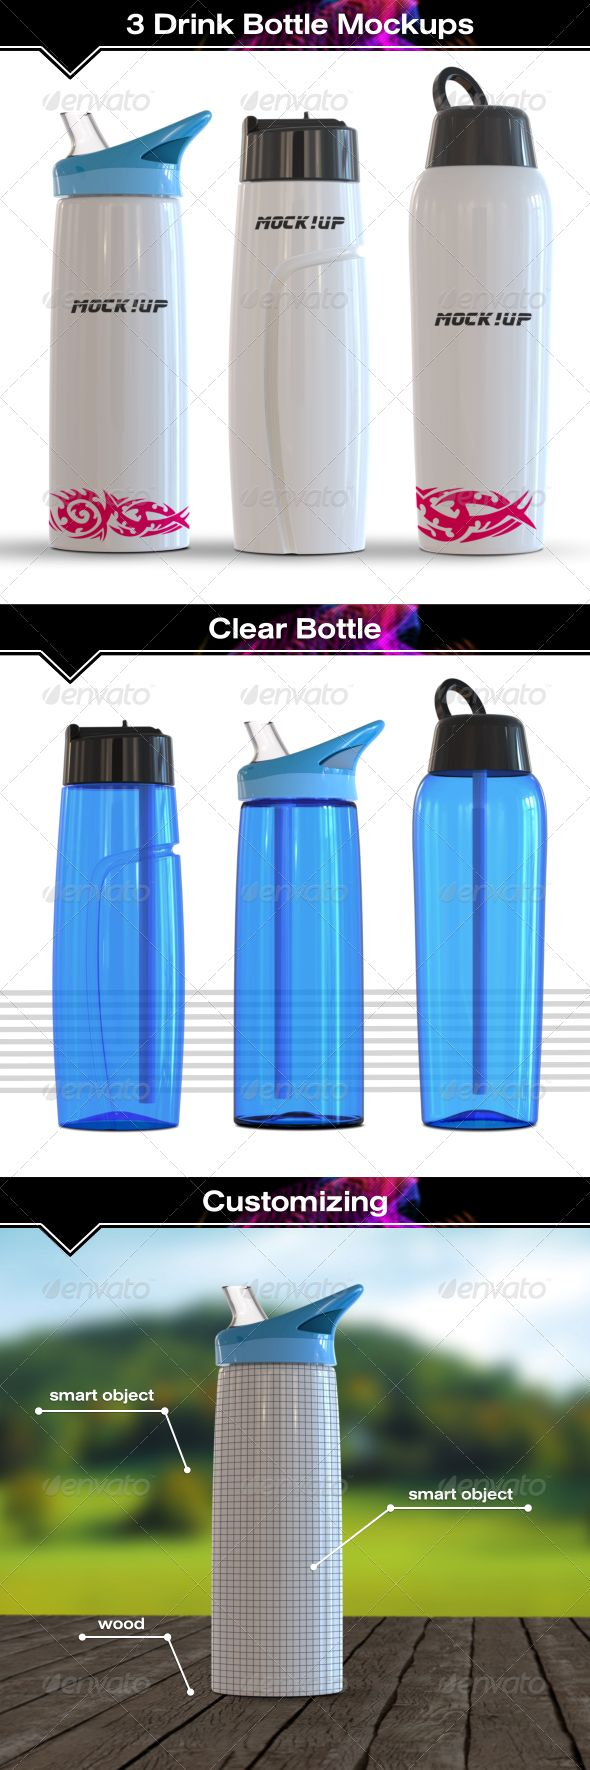 Download 3 Sport Bottle Mockup Bottle Mockup Sport Bottle Bottle